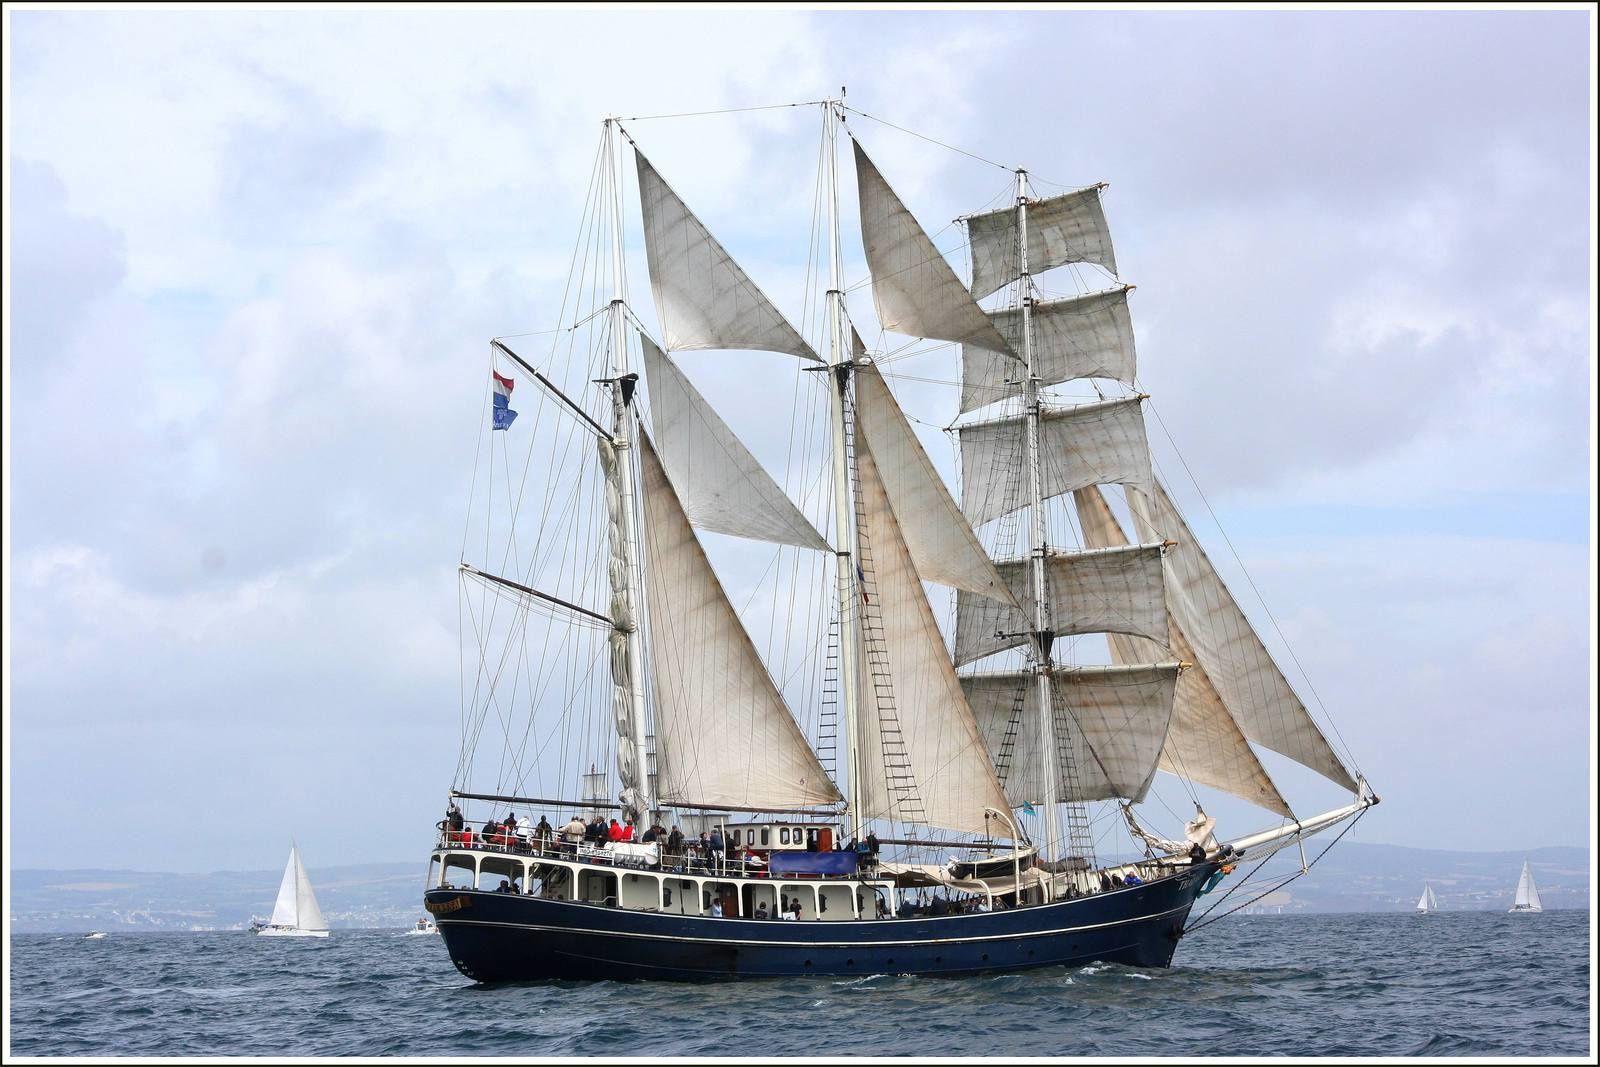 021sb  Rencontres bateaux au fil de l'eau, 7ème, photos © GeoMar, OOSTERCHELDE, JANTEJE, PEDRO DONCKER, SEA CLOUD 4mâts, SKELLIG, THALASSA, RIPPLE, PEEL CASTLE, BEL ESPOIR 2, AR GOELL, ARAWAK, HARDIESSE, BELLE ETOILE, BOC'HANIG, MUTIN, ELISE of LONDON, GERMAINE, KRUZENSHTERN,